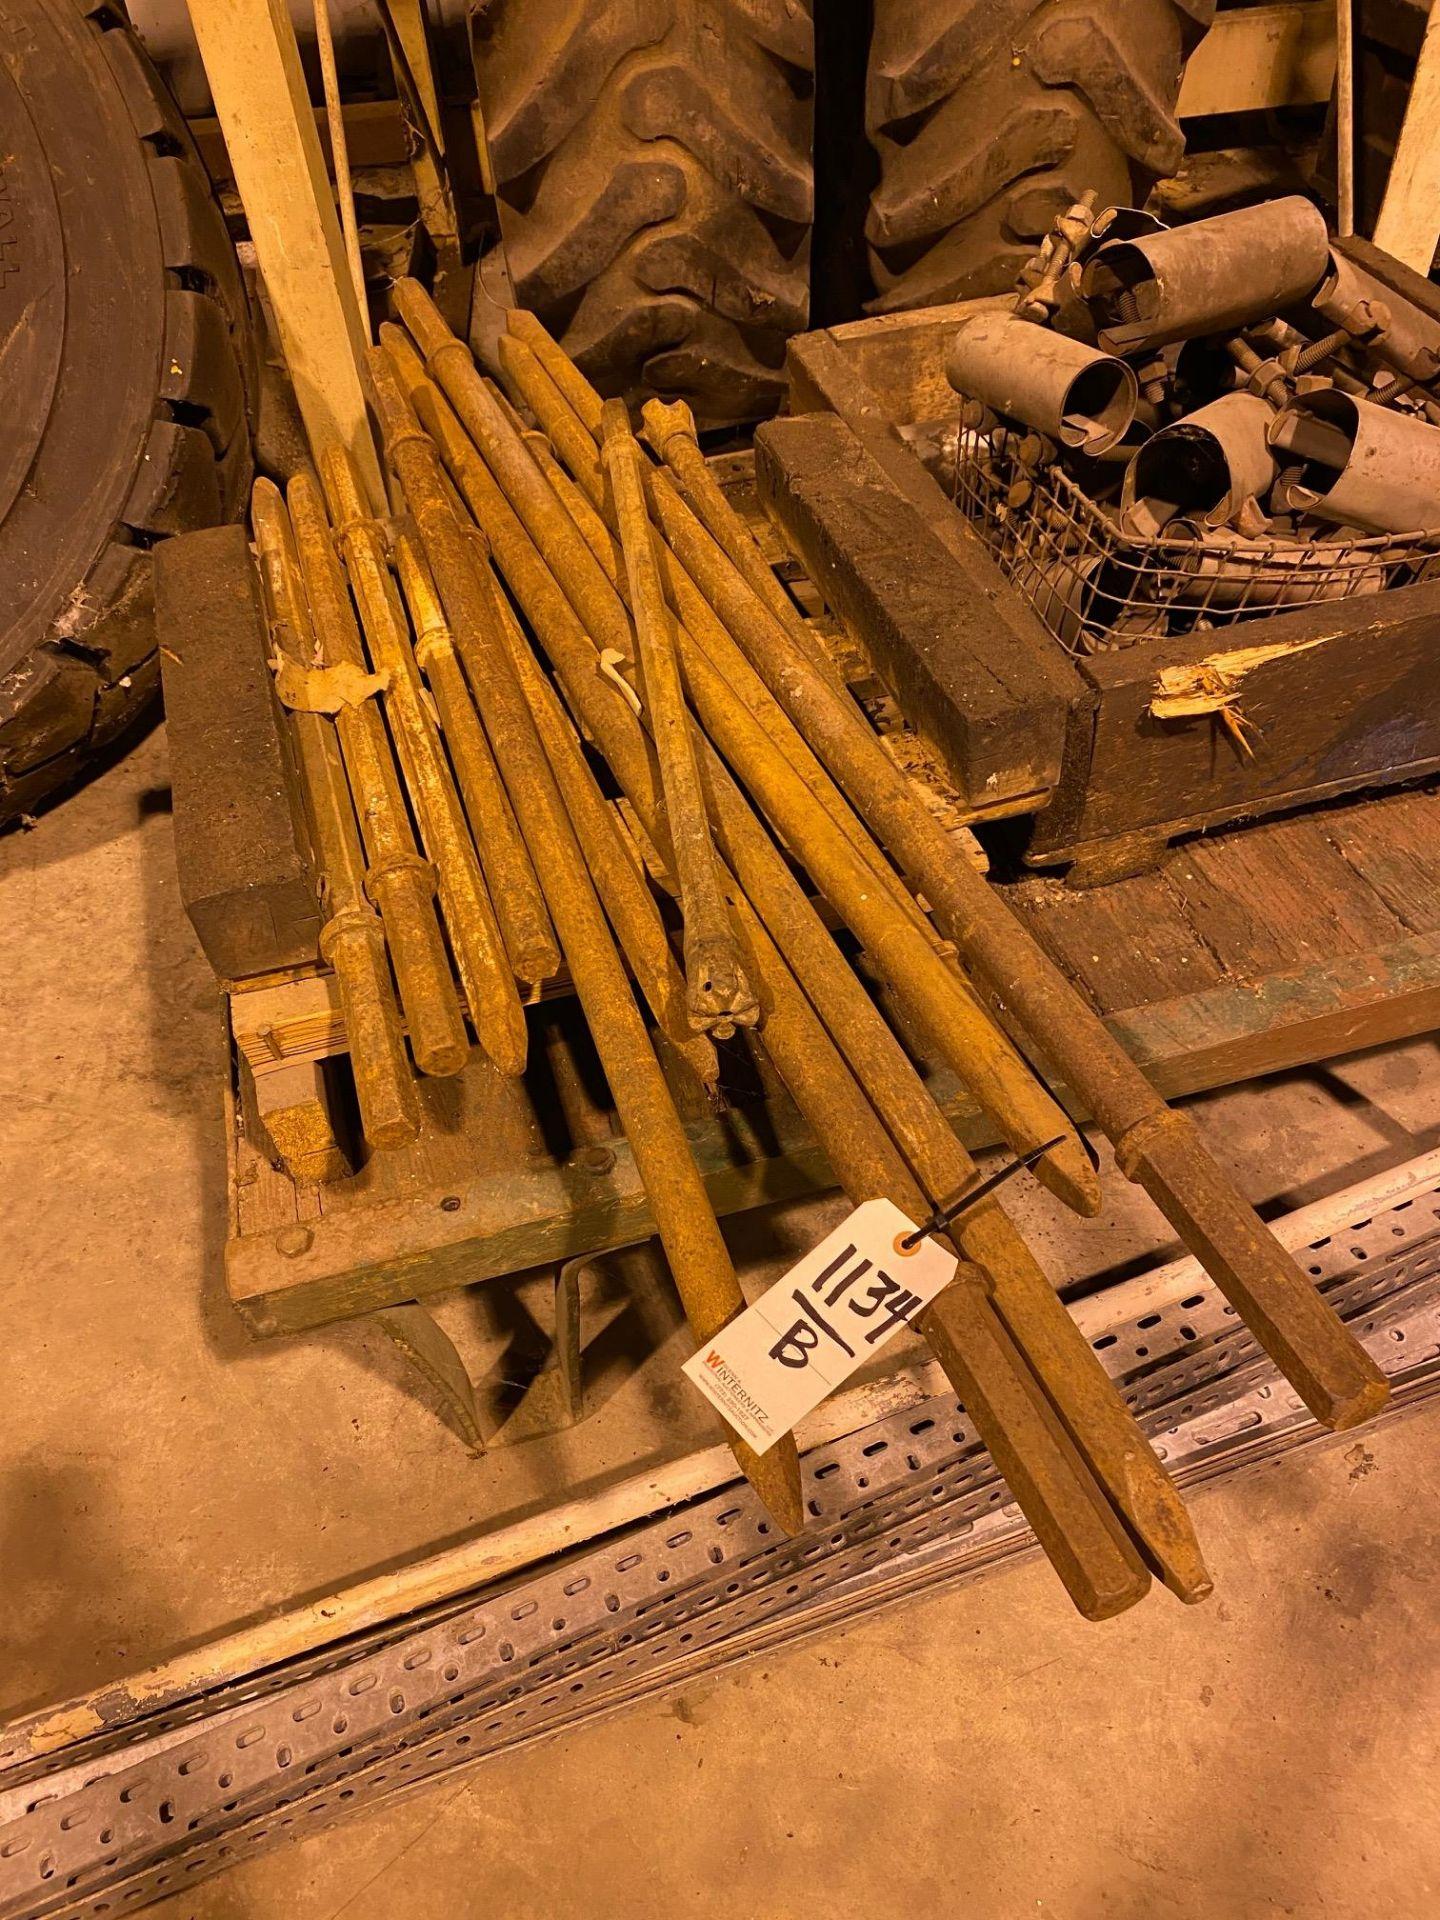 LOT: (2) Jack Hammers & Chisels (points) (South Beloit) - Image 2 of 2